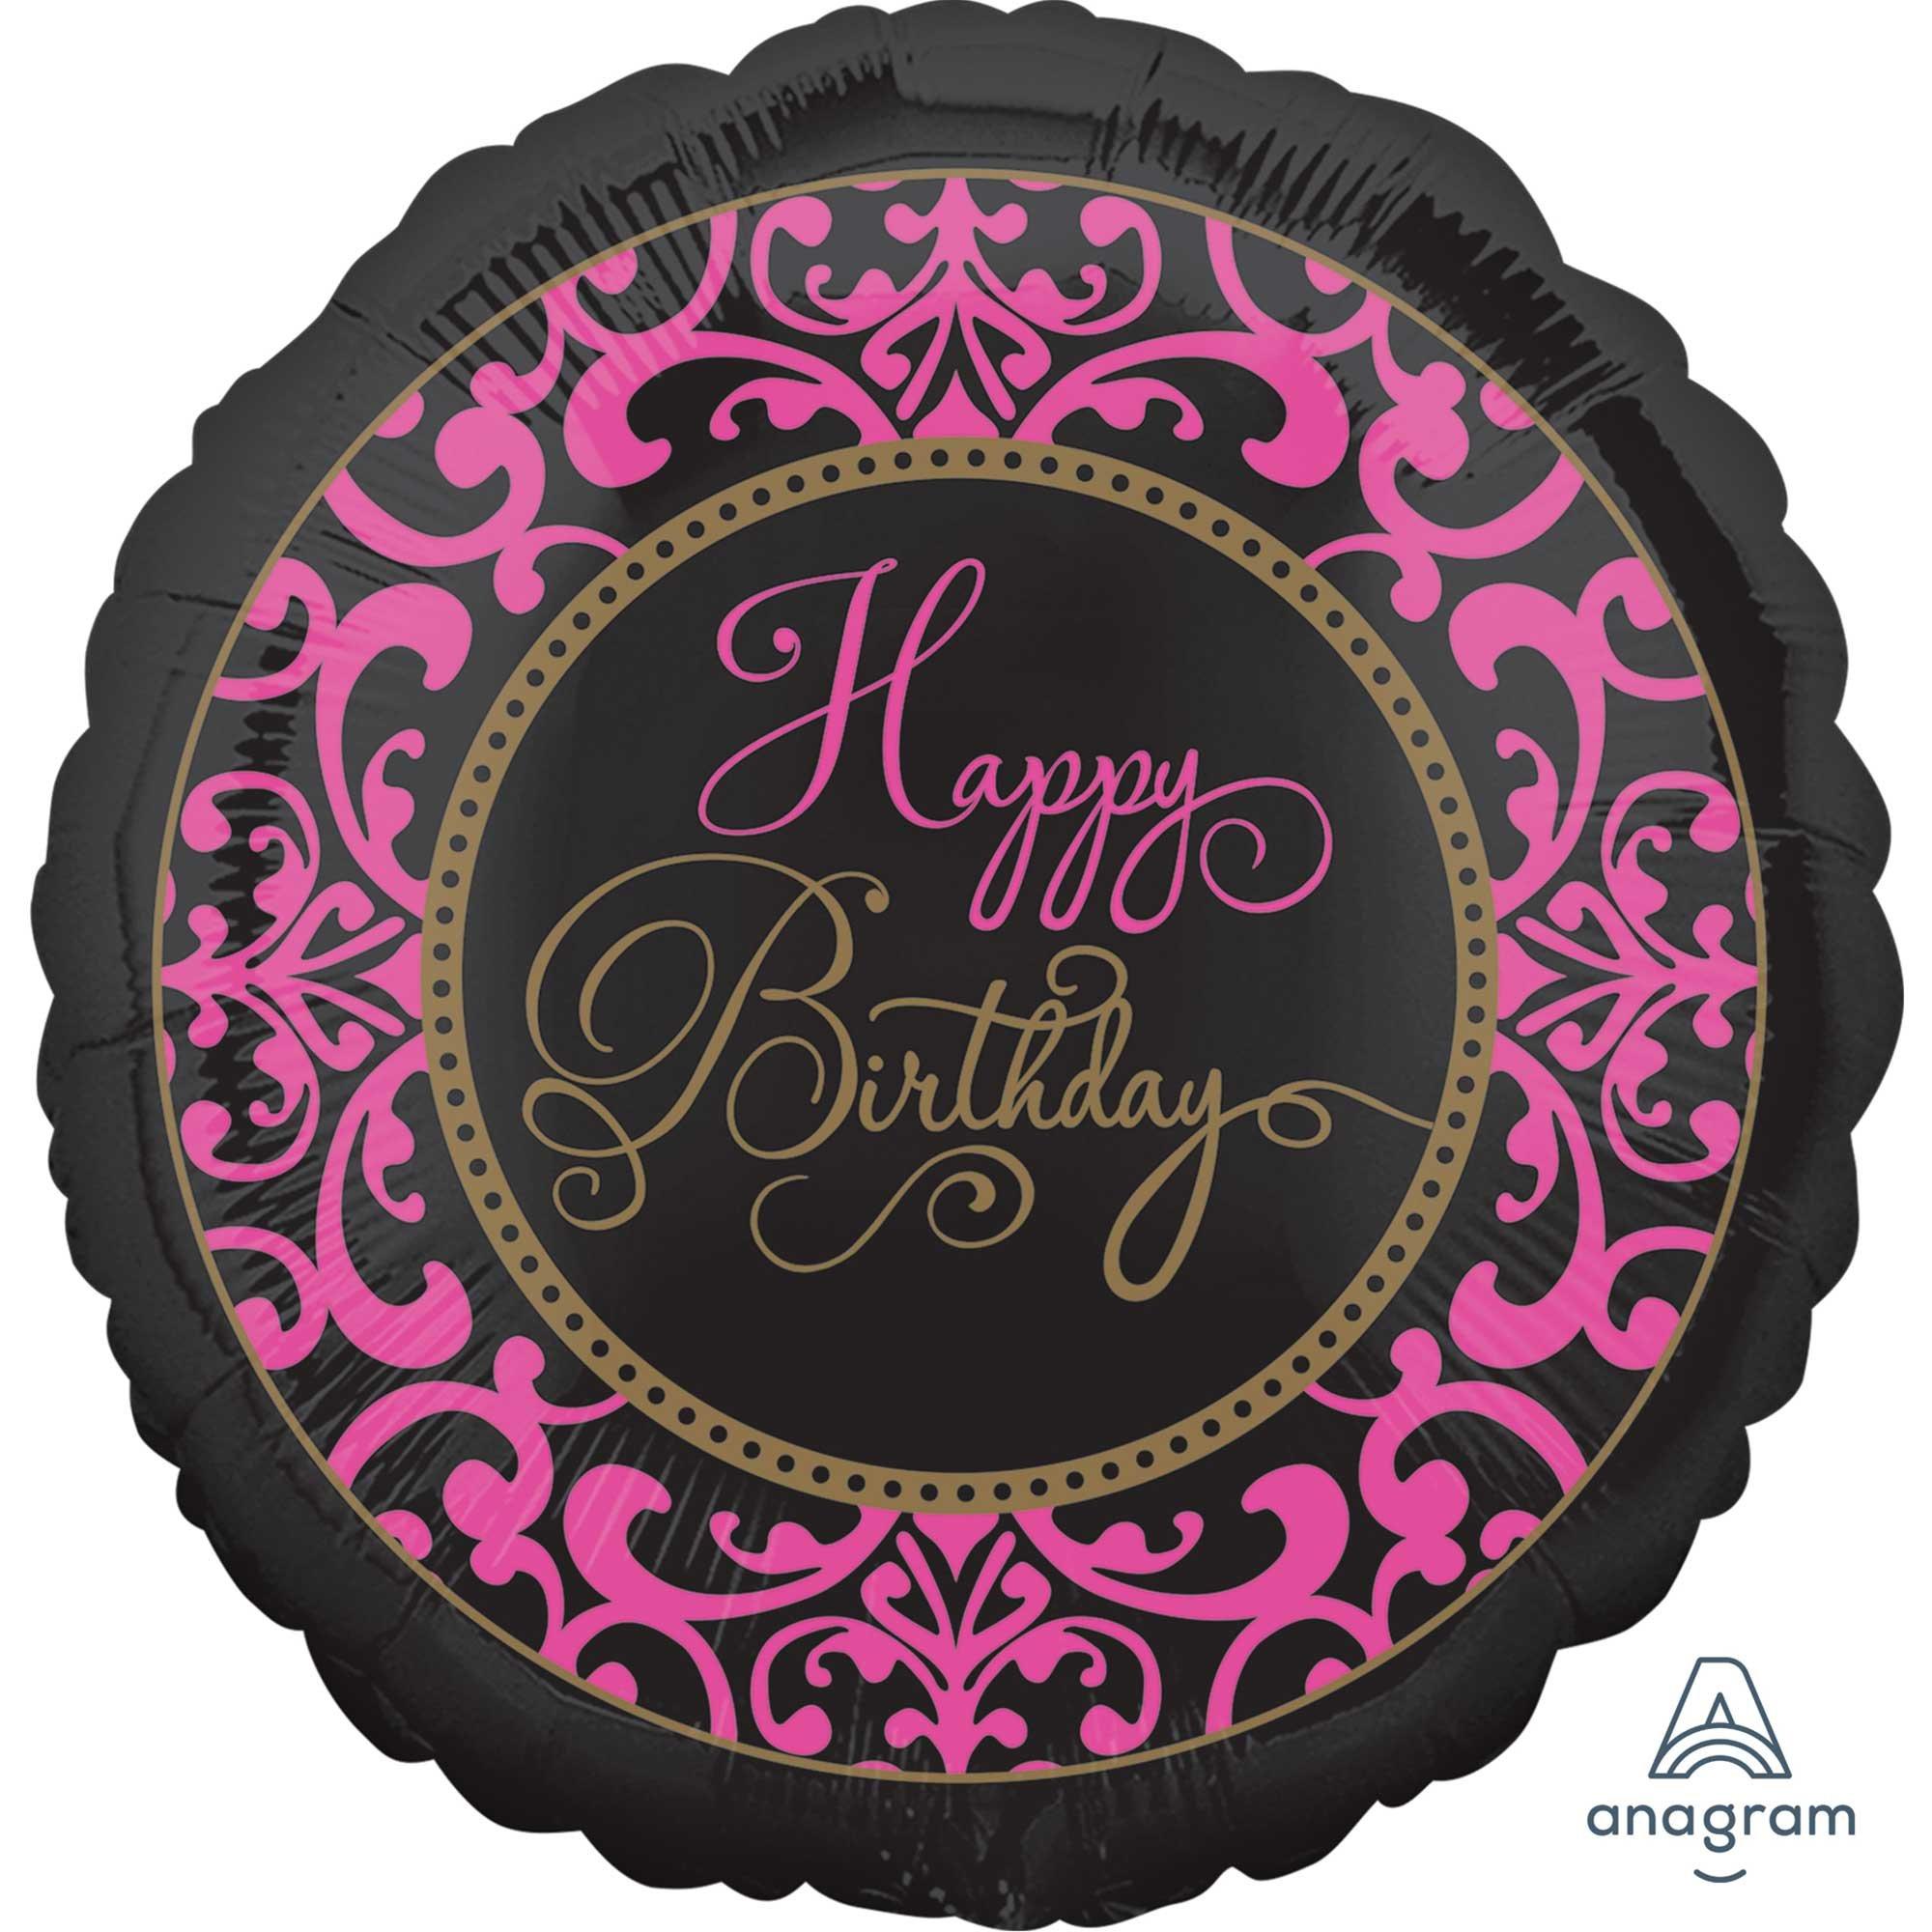 45cm Standard HX Happy Birthday Fabulous Celebration S40